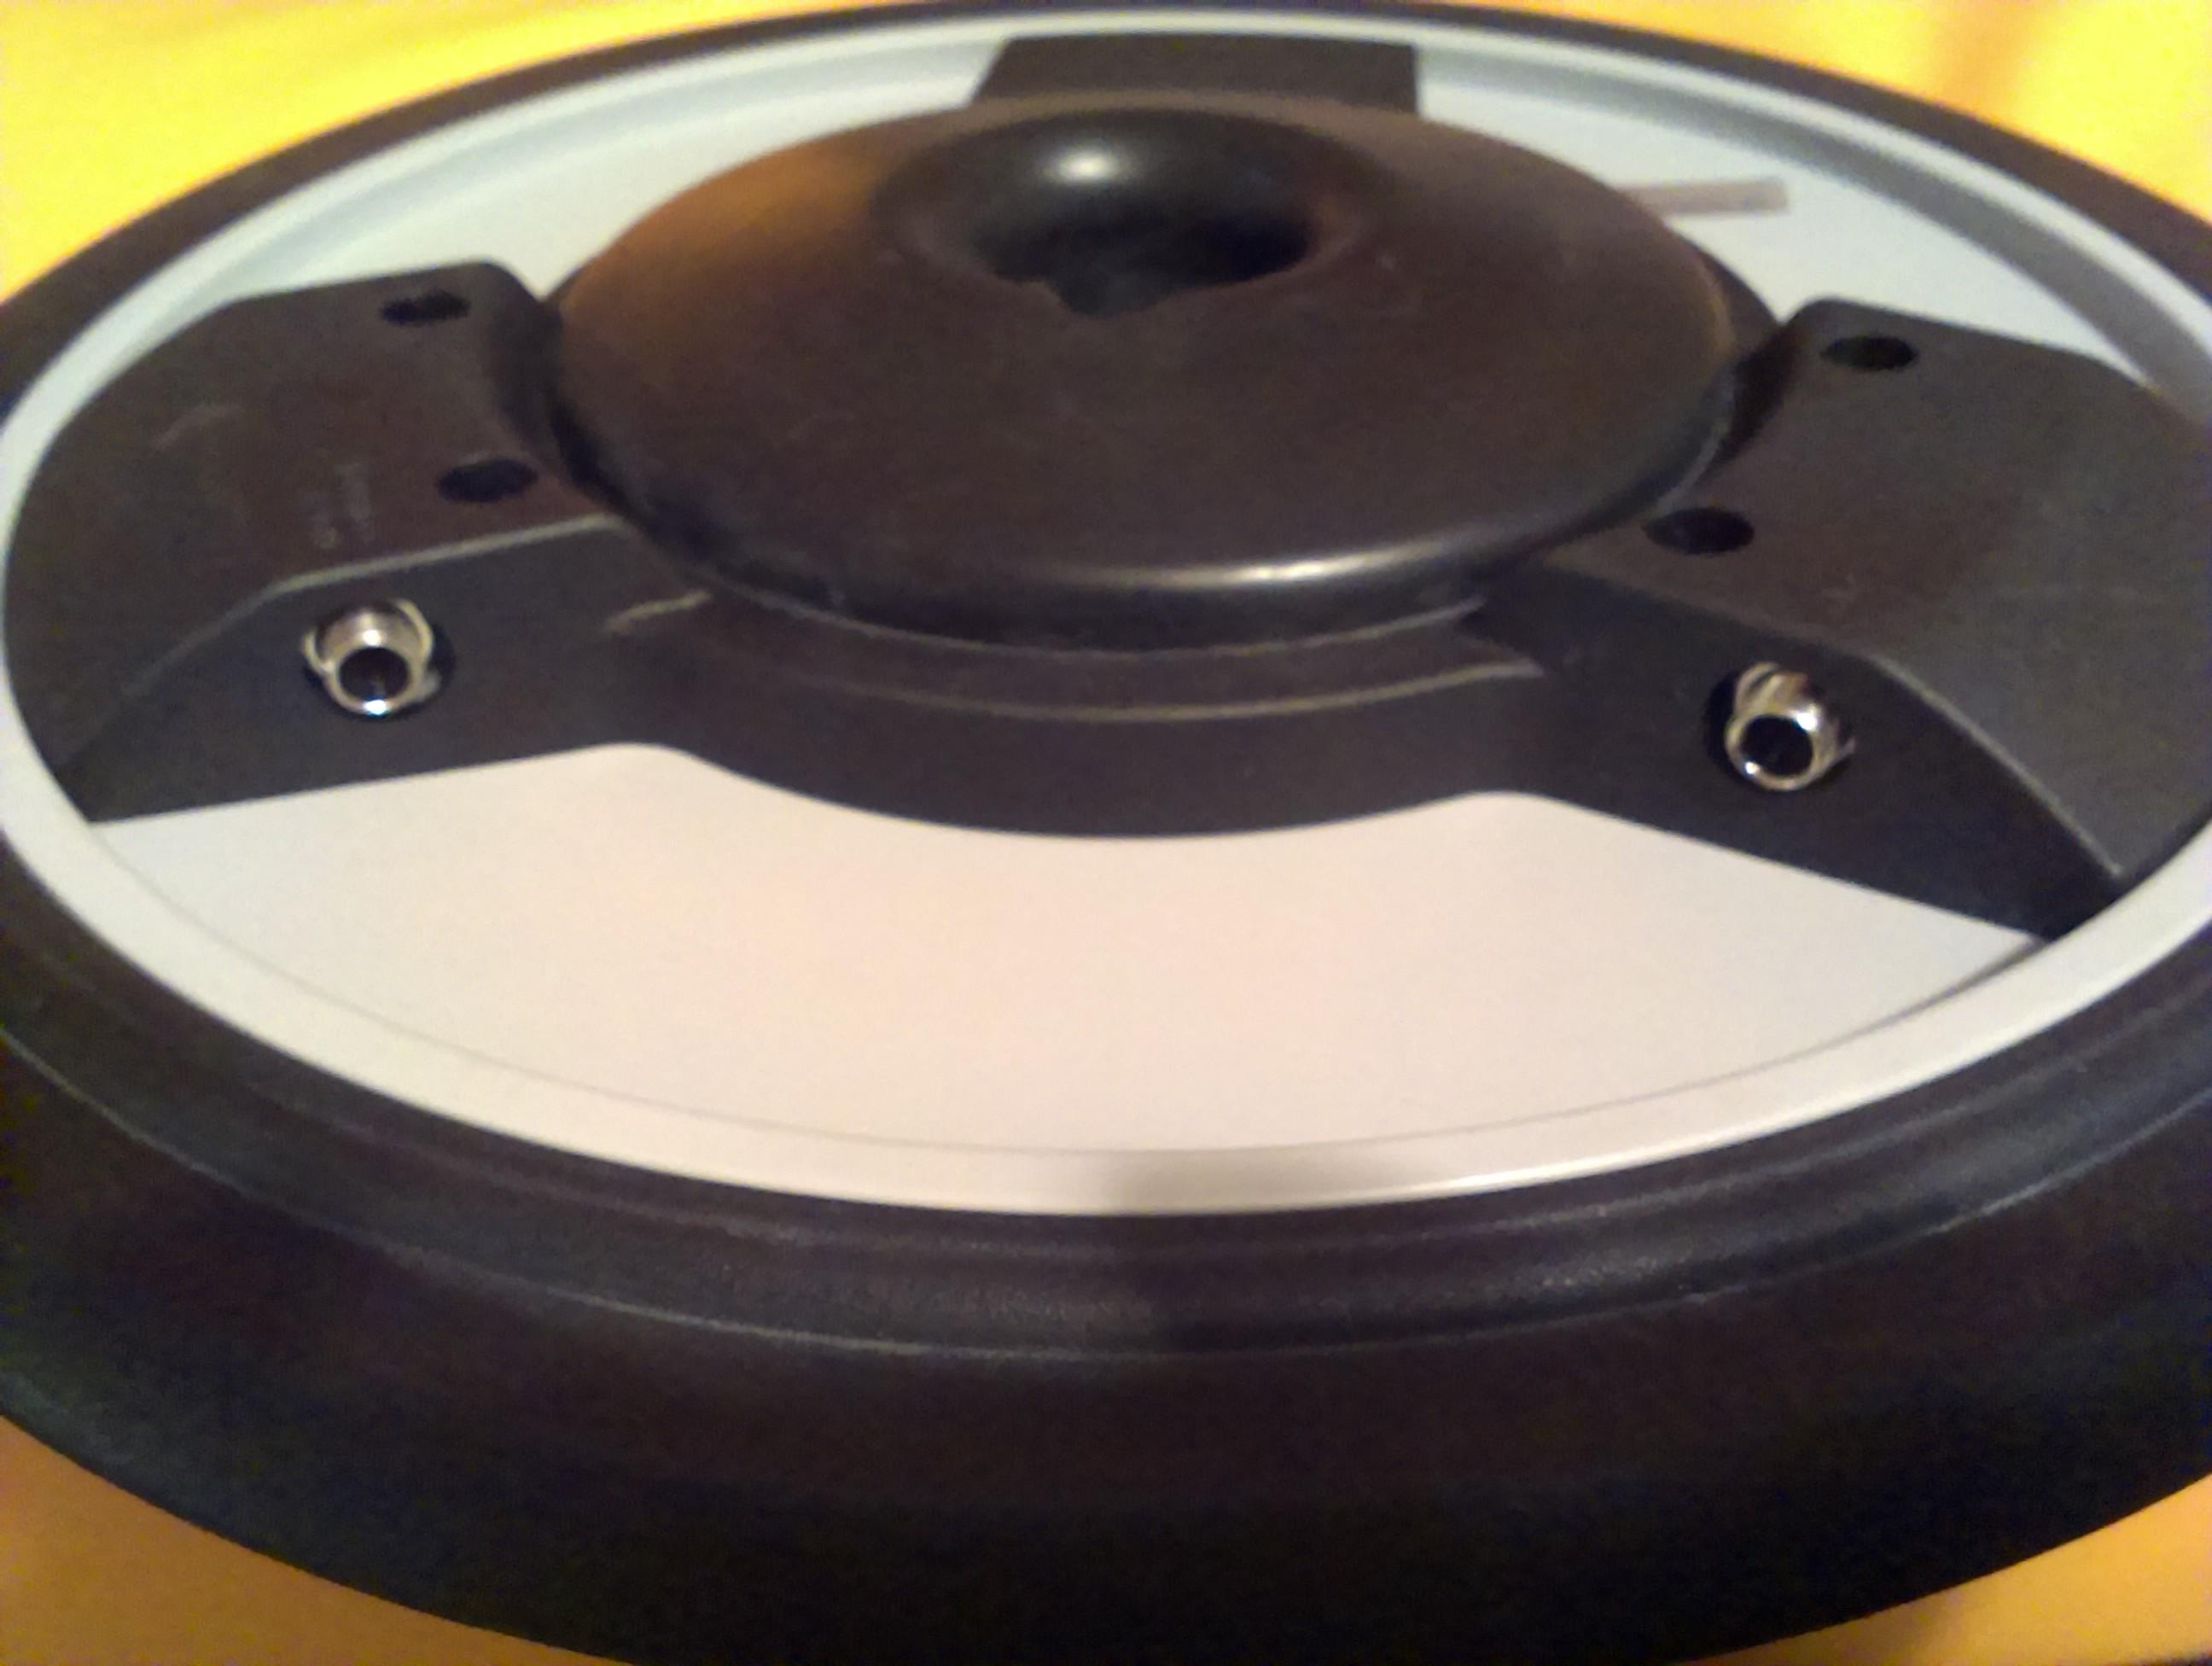 Yamaha dtxpress ii image 1666312 audiofanzine for Yamaha dtxpress review